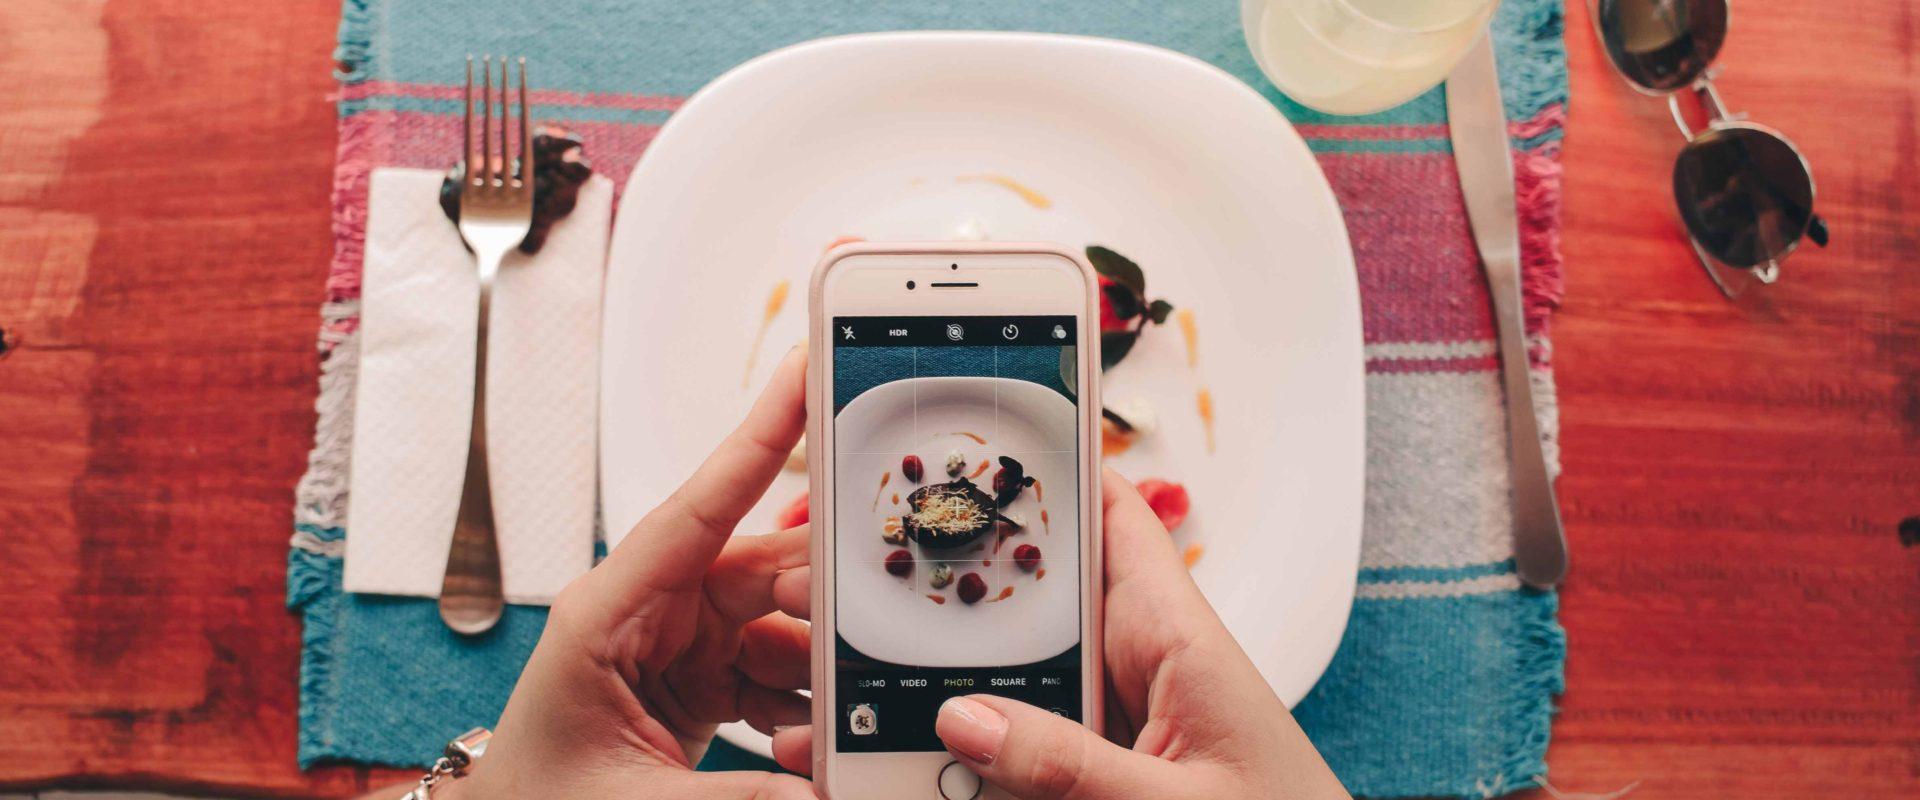 Permalink zu:App des Monats: My CookBook